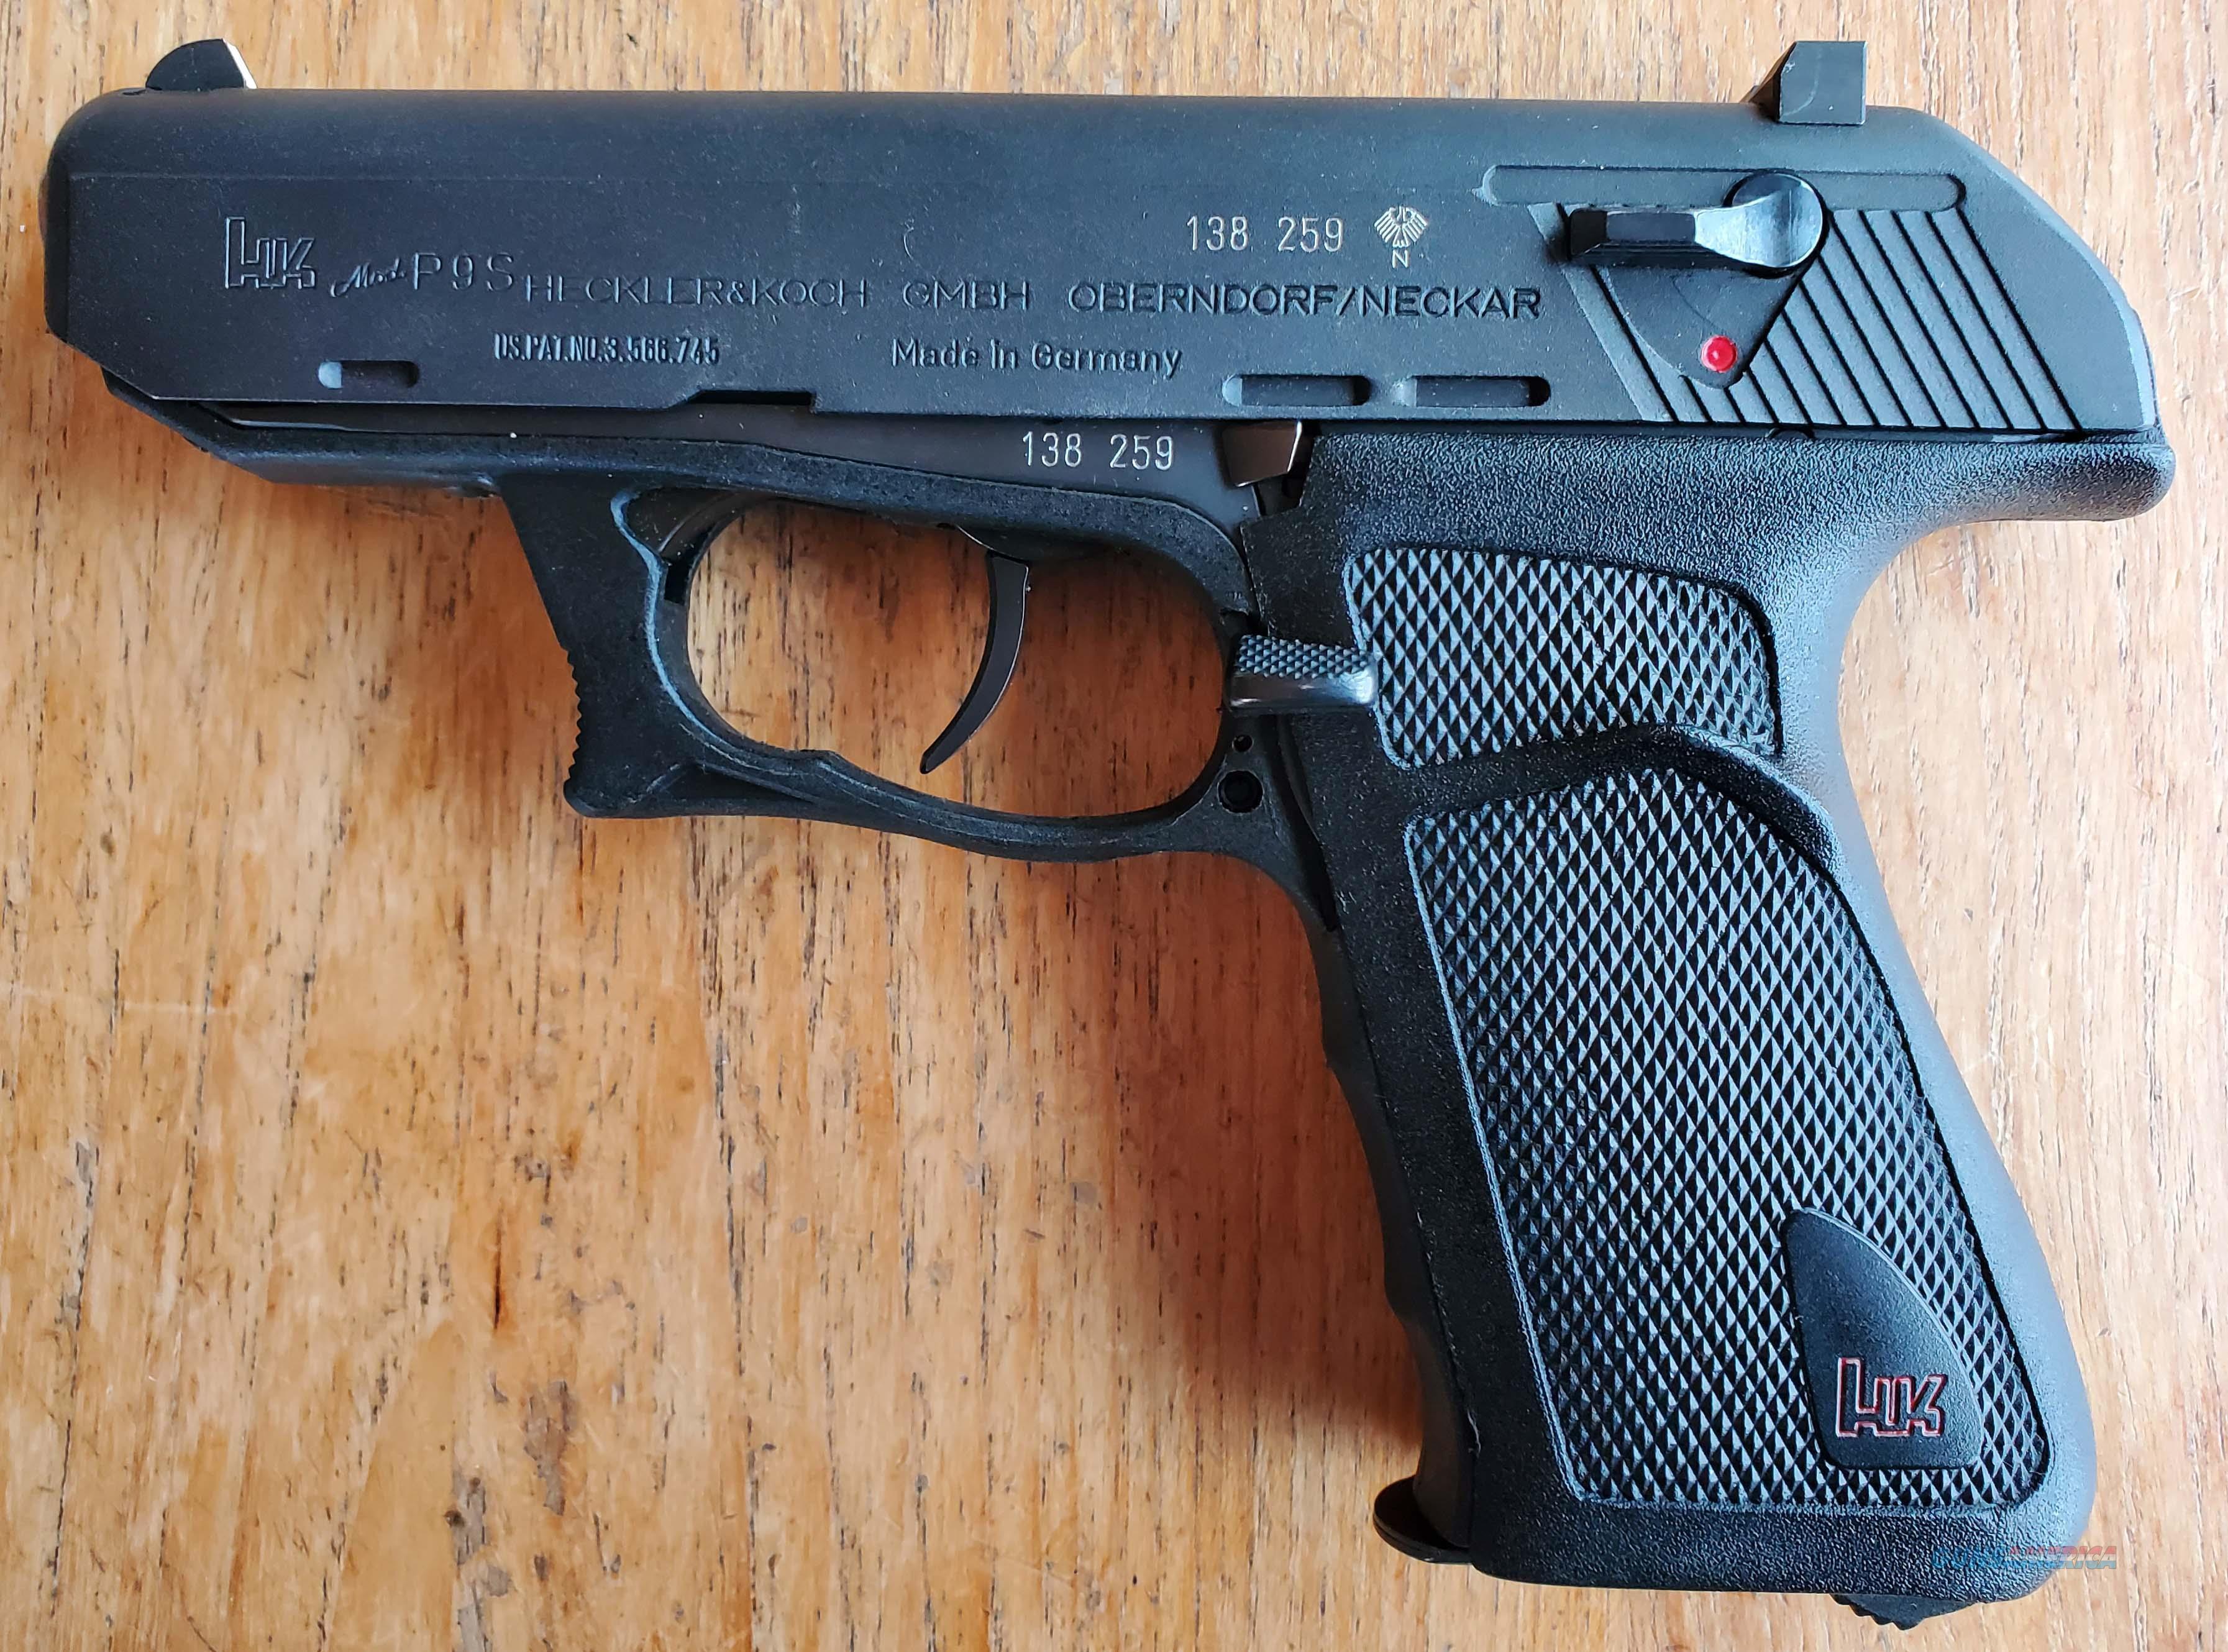 WTS P9S 9mm  Guns > Pistols > Heckler & Koch Pistols > SteelFrame